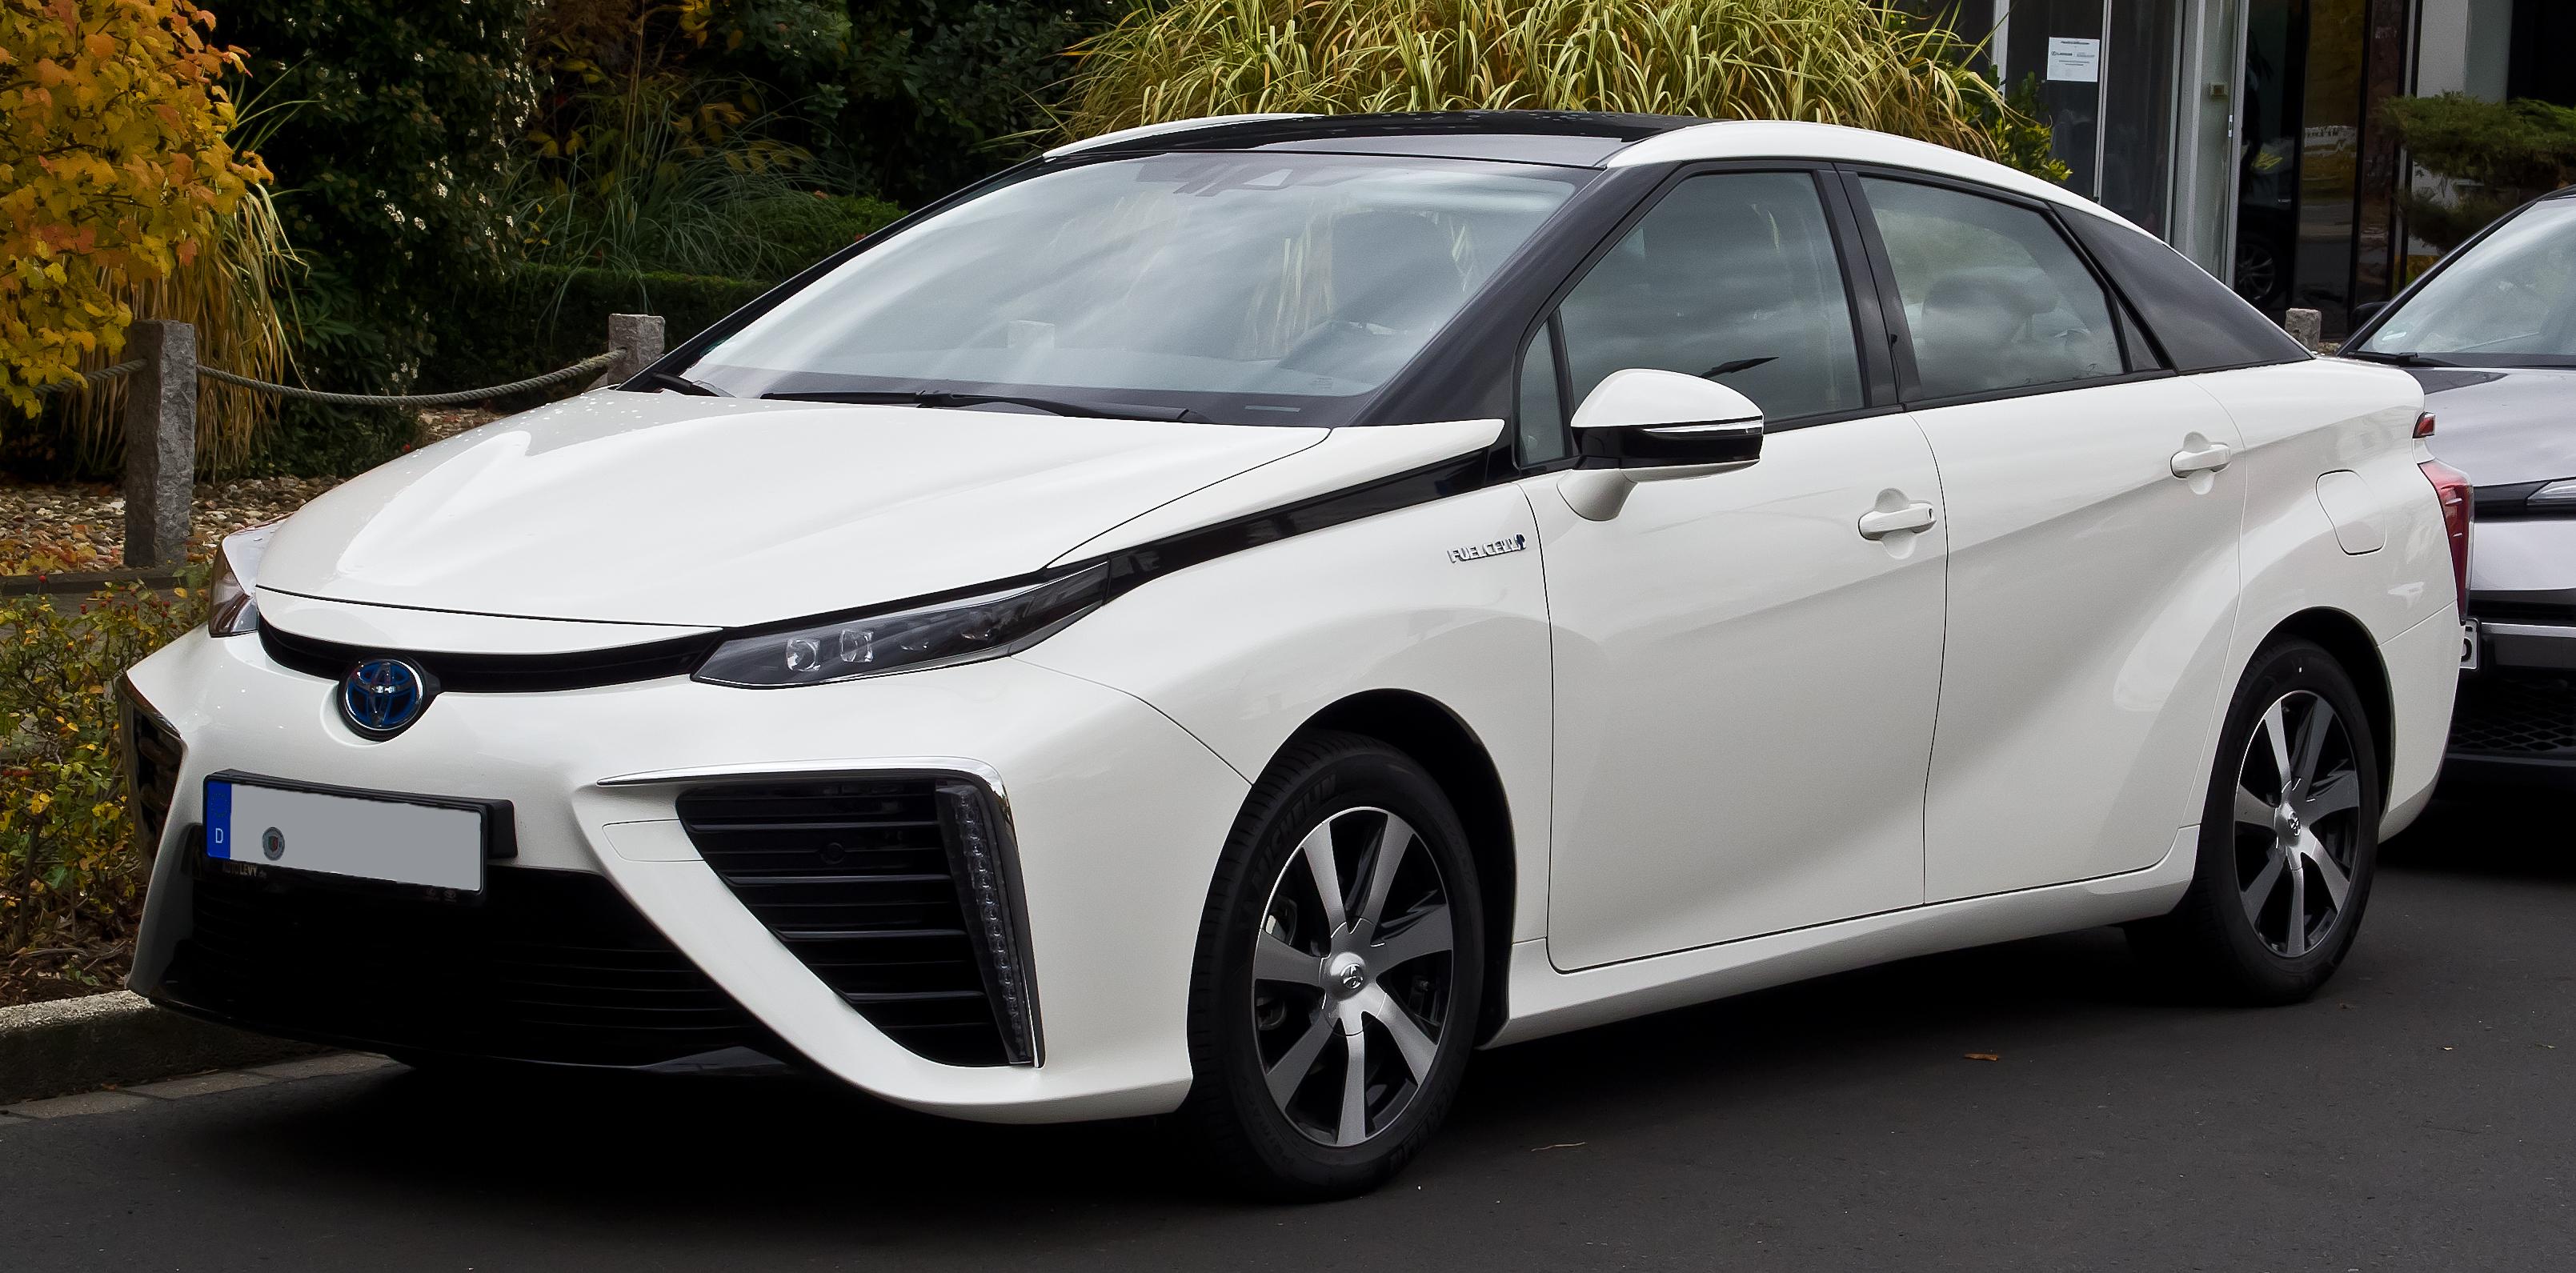 Toyota Mirai - Wikipedia